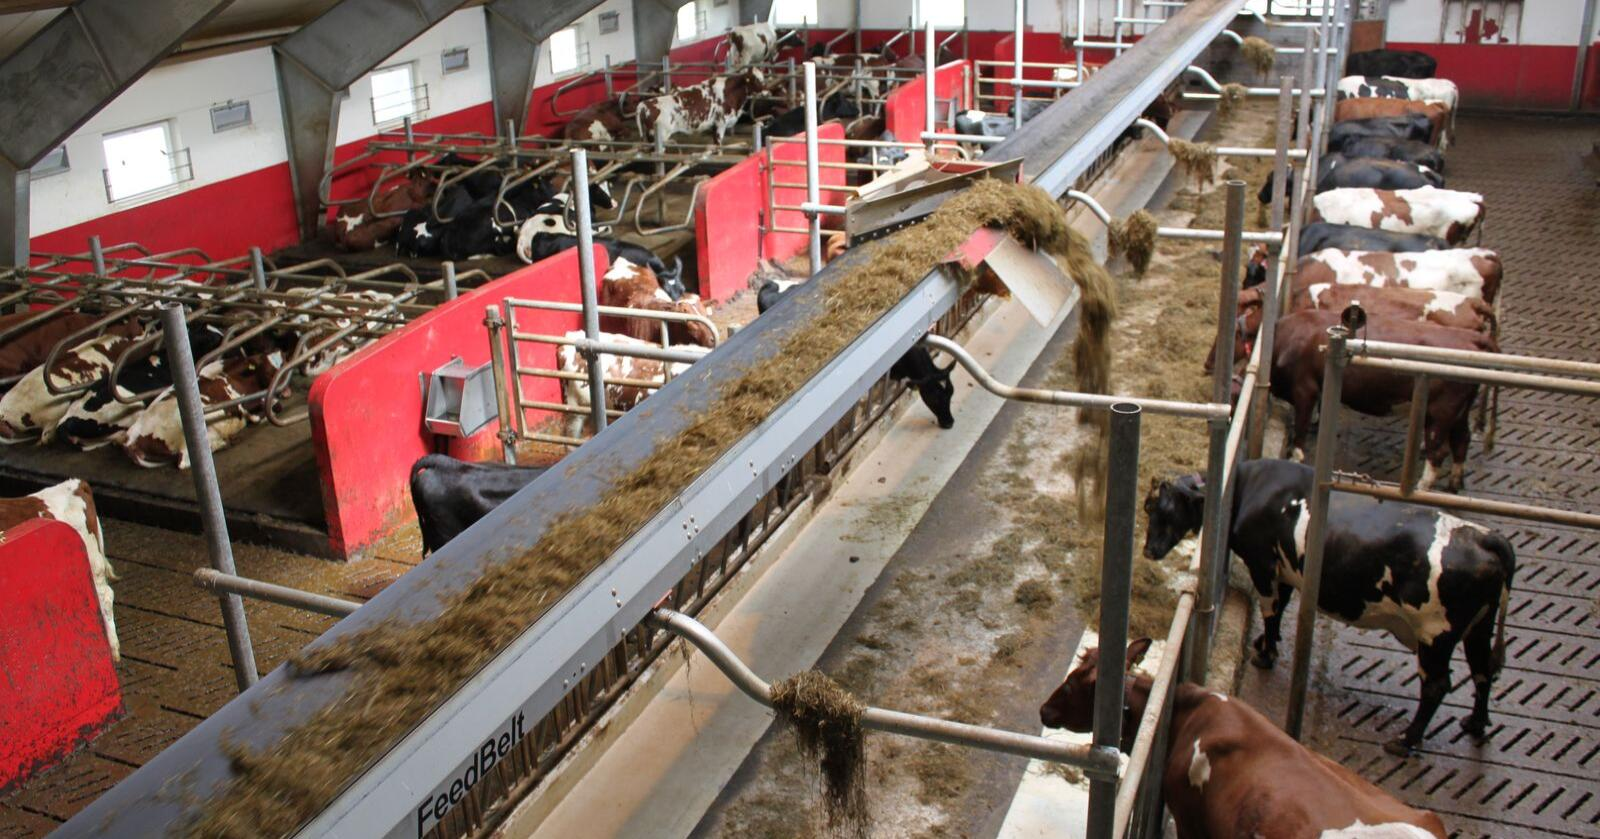 TKS FeedBelt: Med båndfôring i taket kan man krympe fôrbrettet ned mot én meter, dersom man legger ut på en side av båndet. Foto: Dag Idar Jøsang